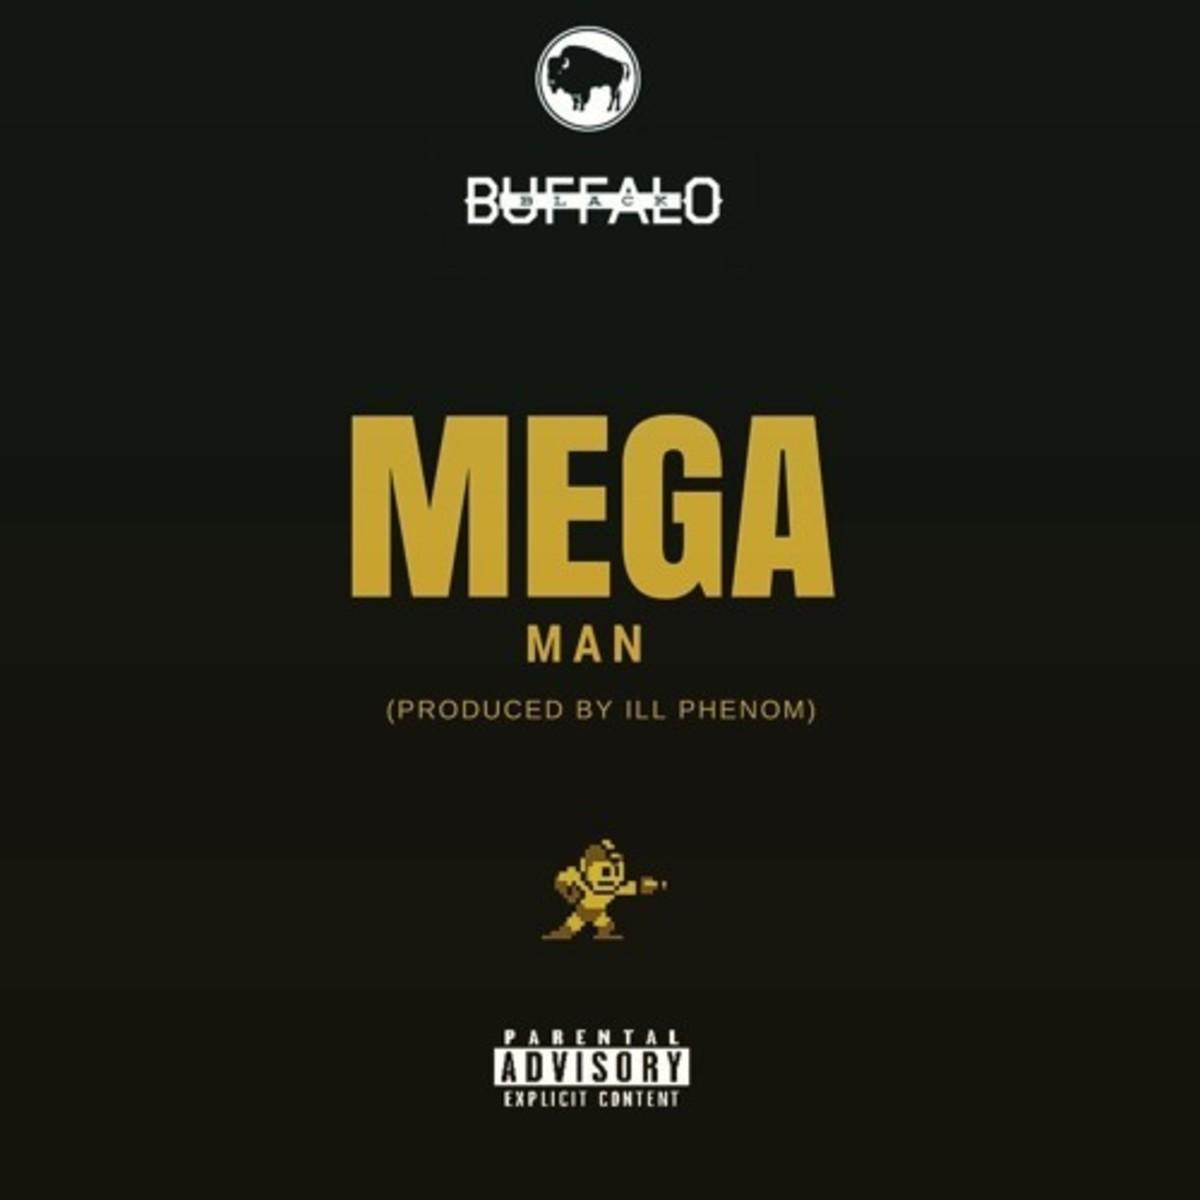 buffalo-black-mega-man.jpg